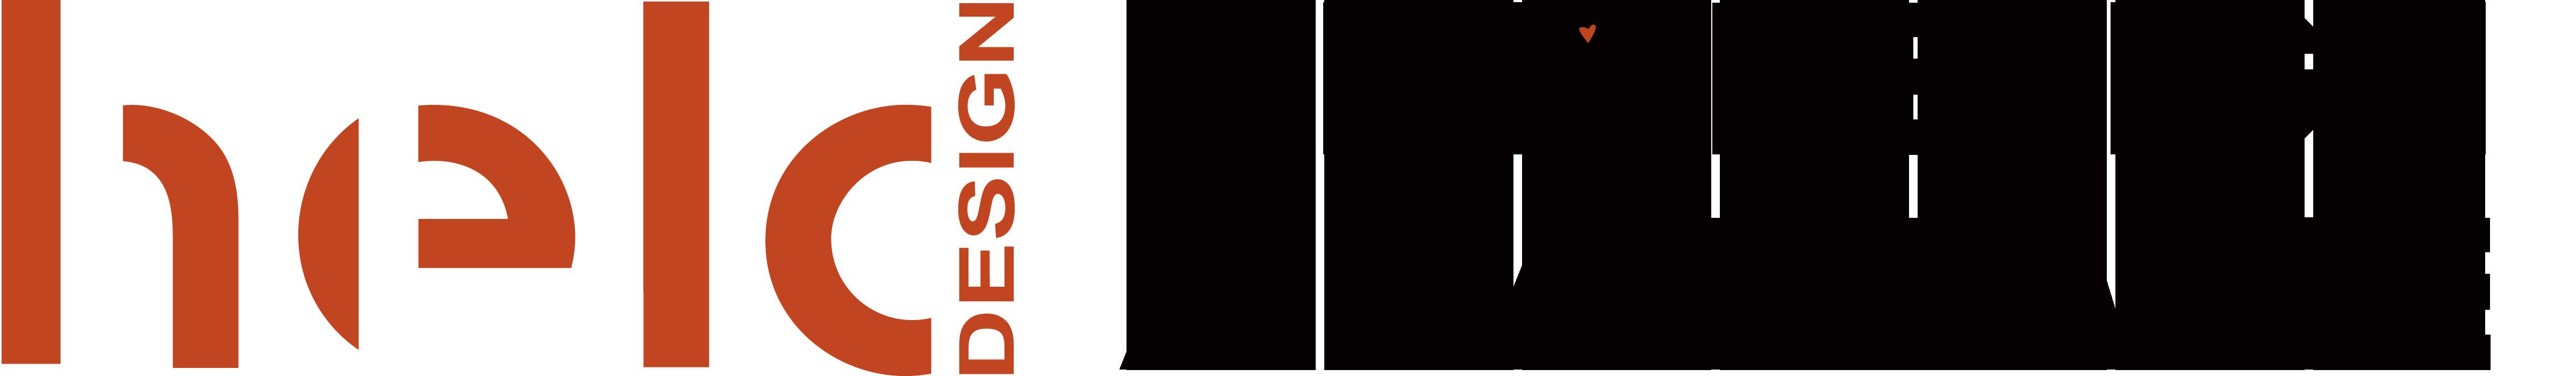 held_design_logo_CHI*_DESIGN_rot